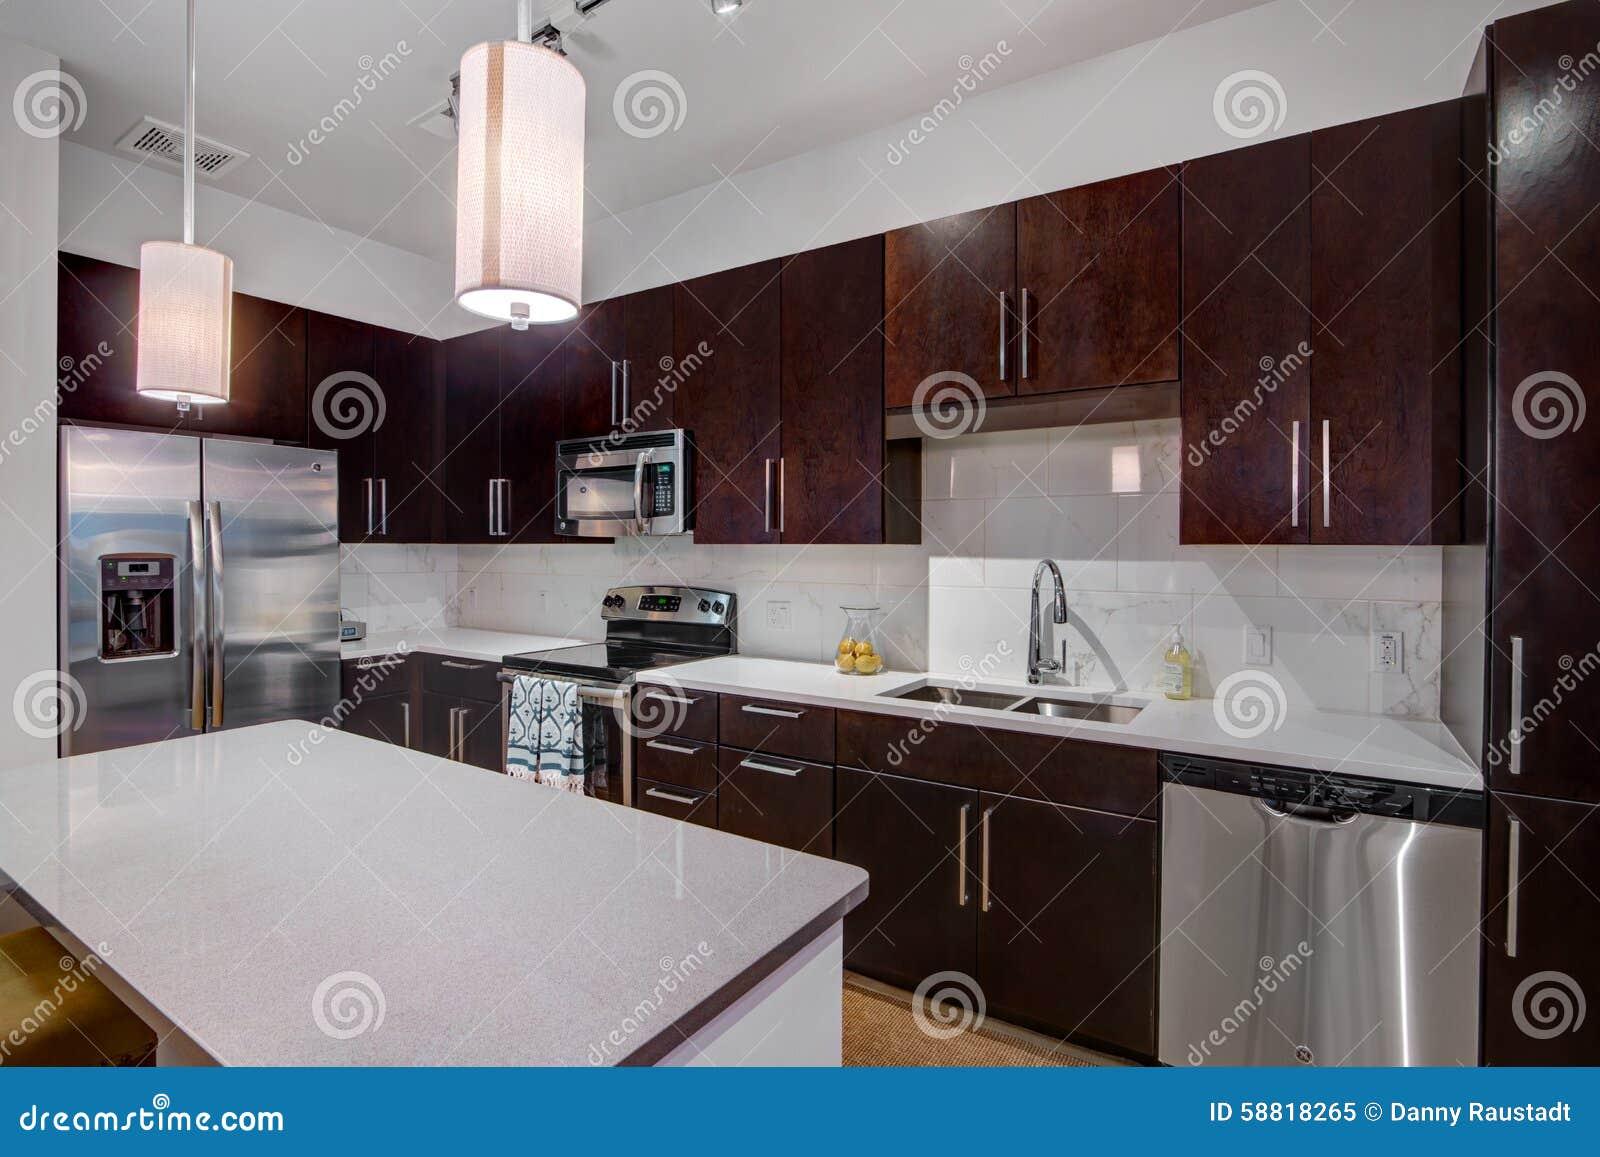 Modern apartment kitchen stock photo image 58818265 - Mur couleur framboise ...